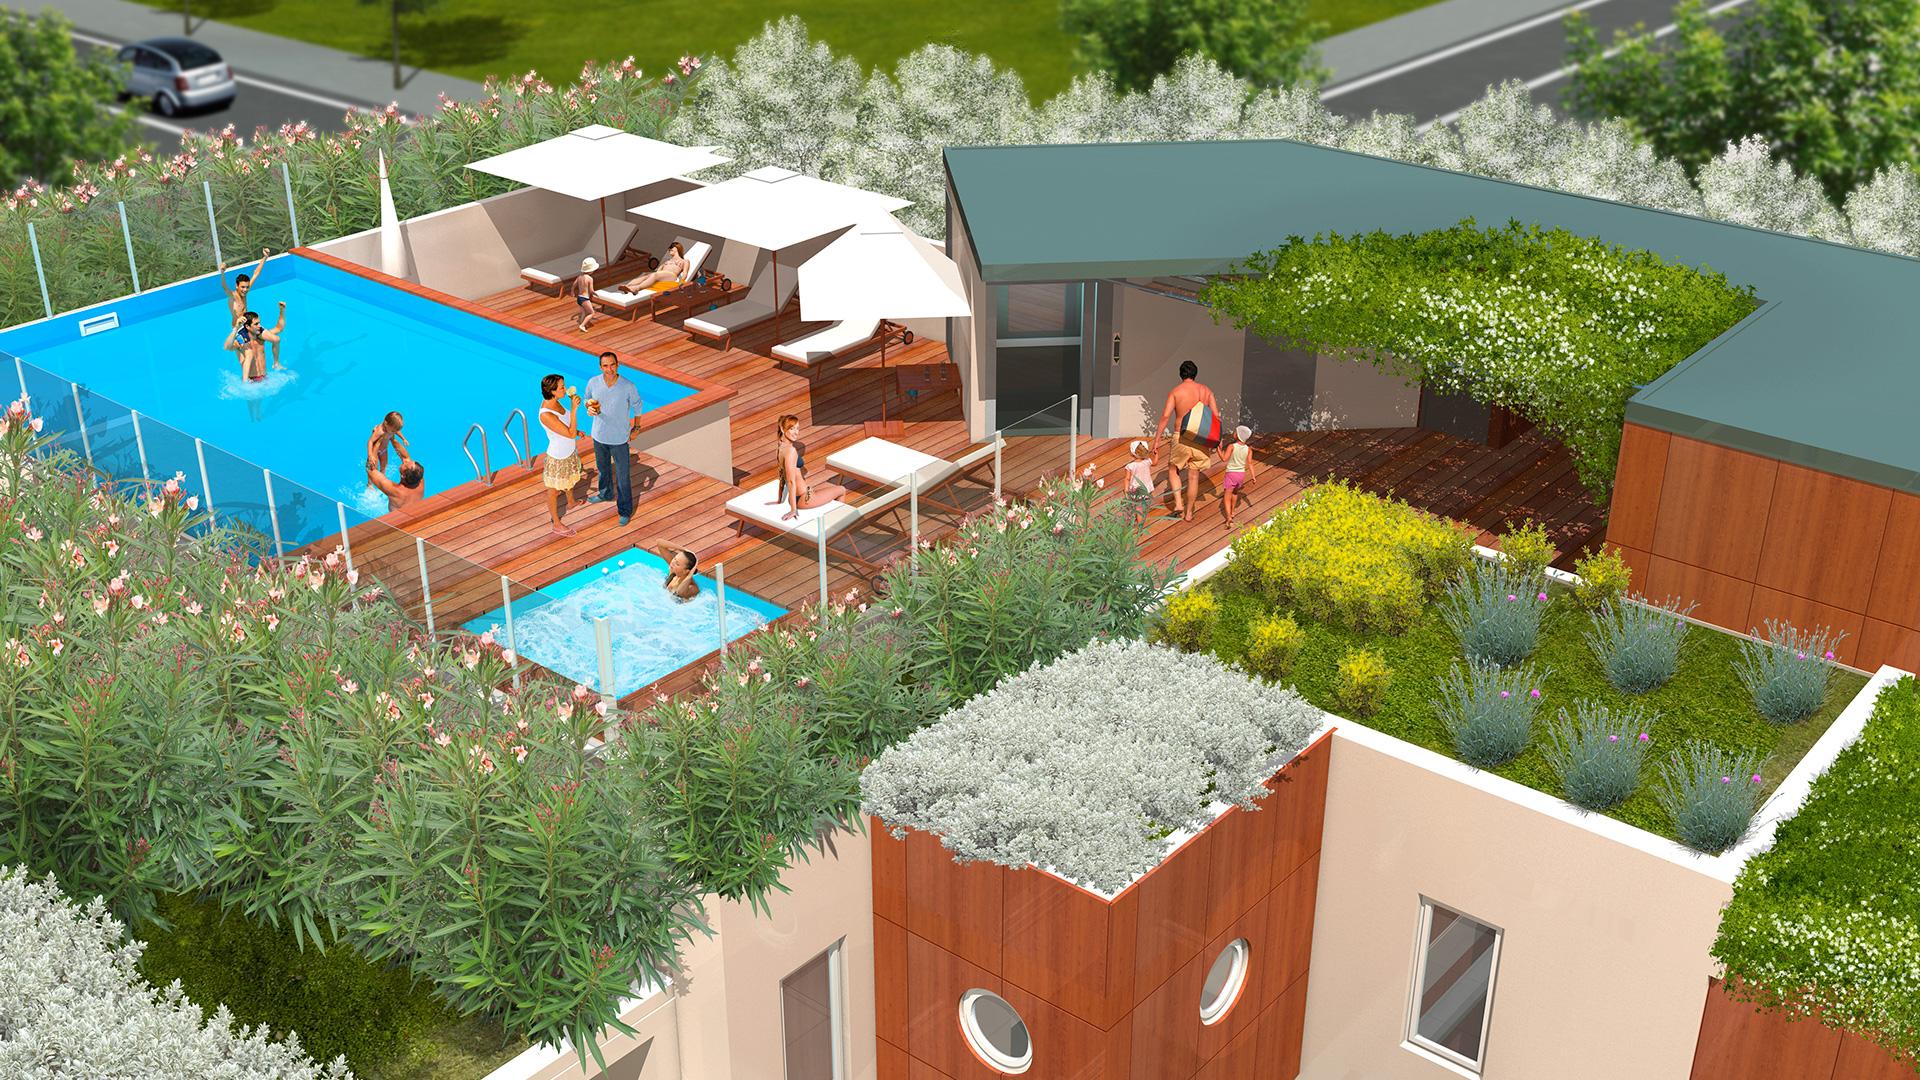 Vue du toit avec piscine